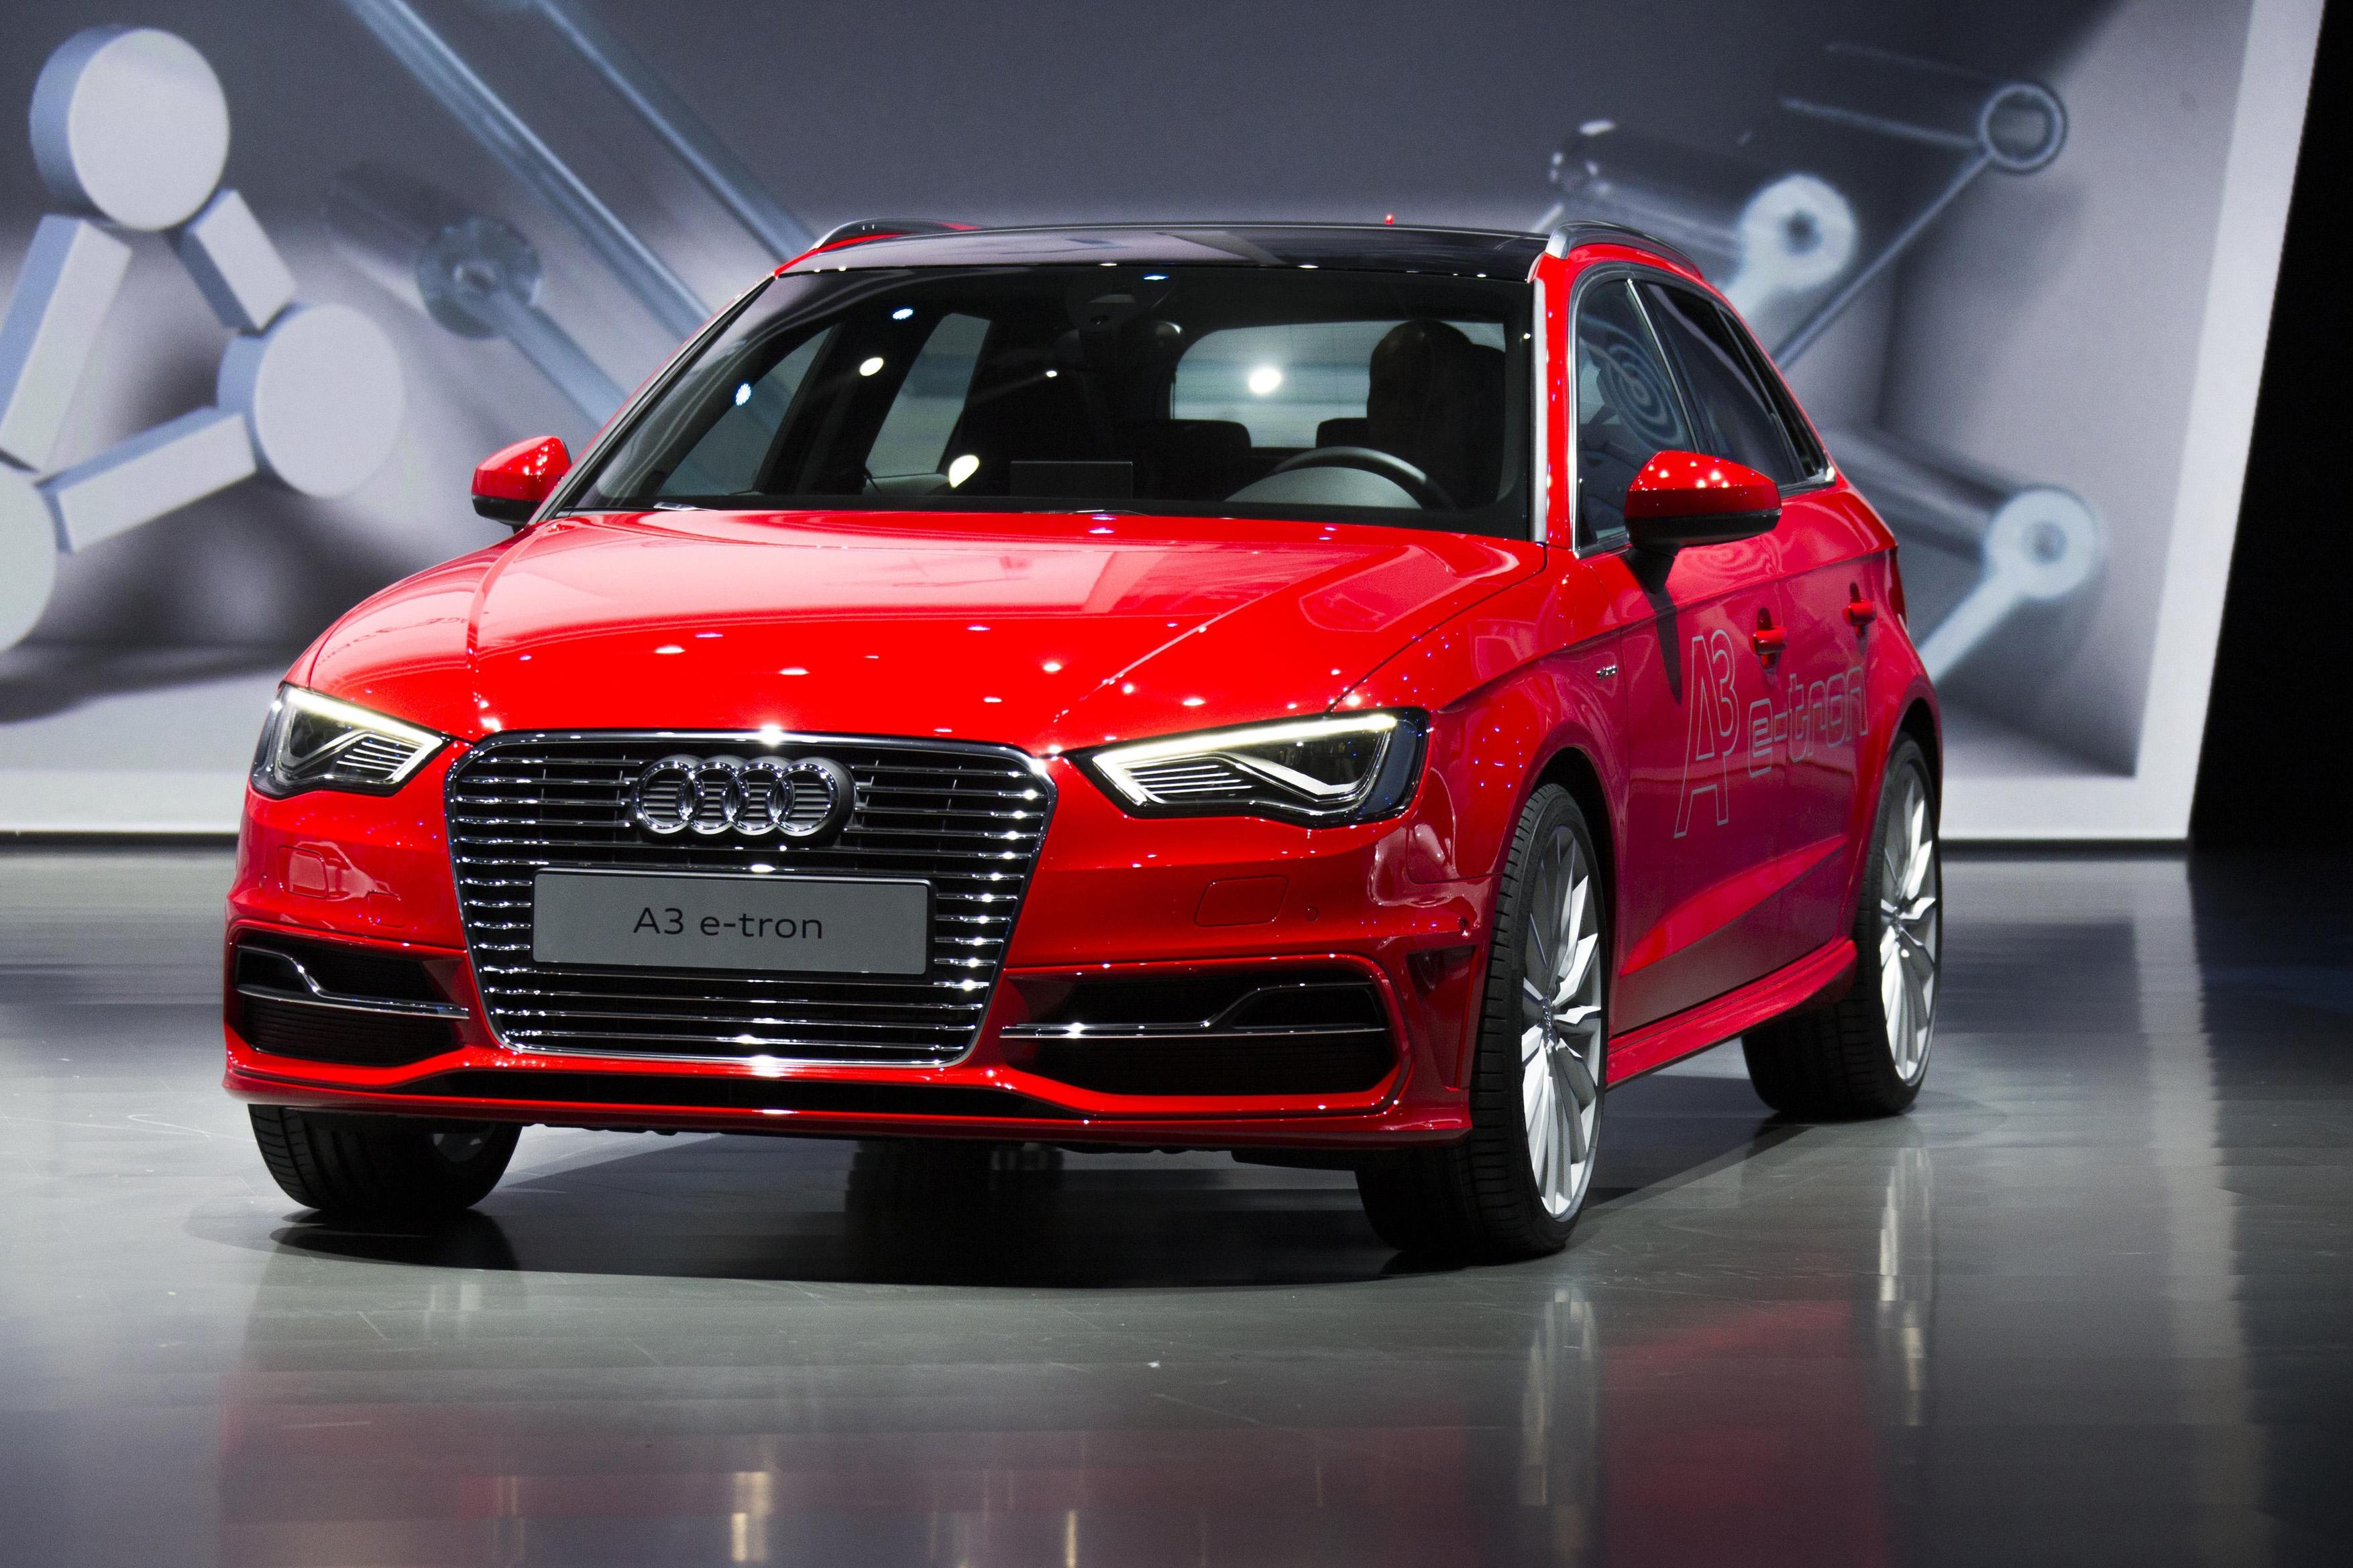 Pictures Of Audi A3 Sportback E Tron